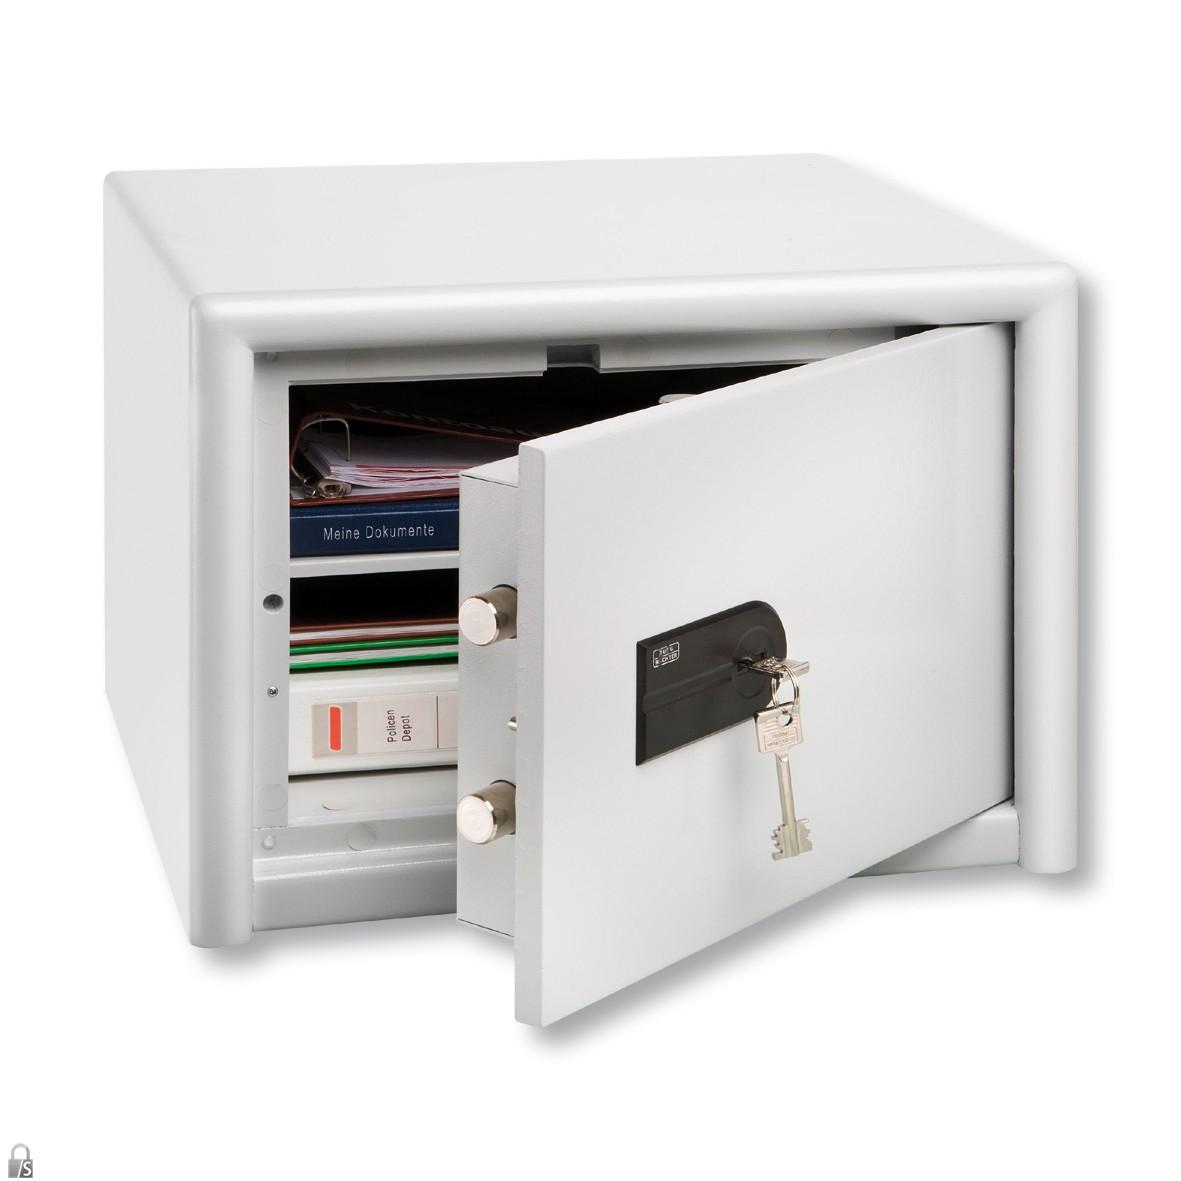 burg w chter tresor combi line freistehende tresore tresore sicherheitstechnik shop. Black Bedroom Furniture Sets. Home Design Ideas